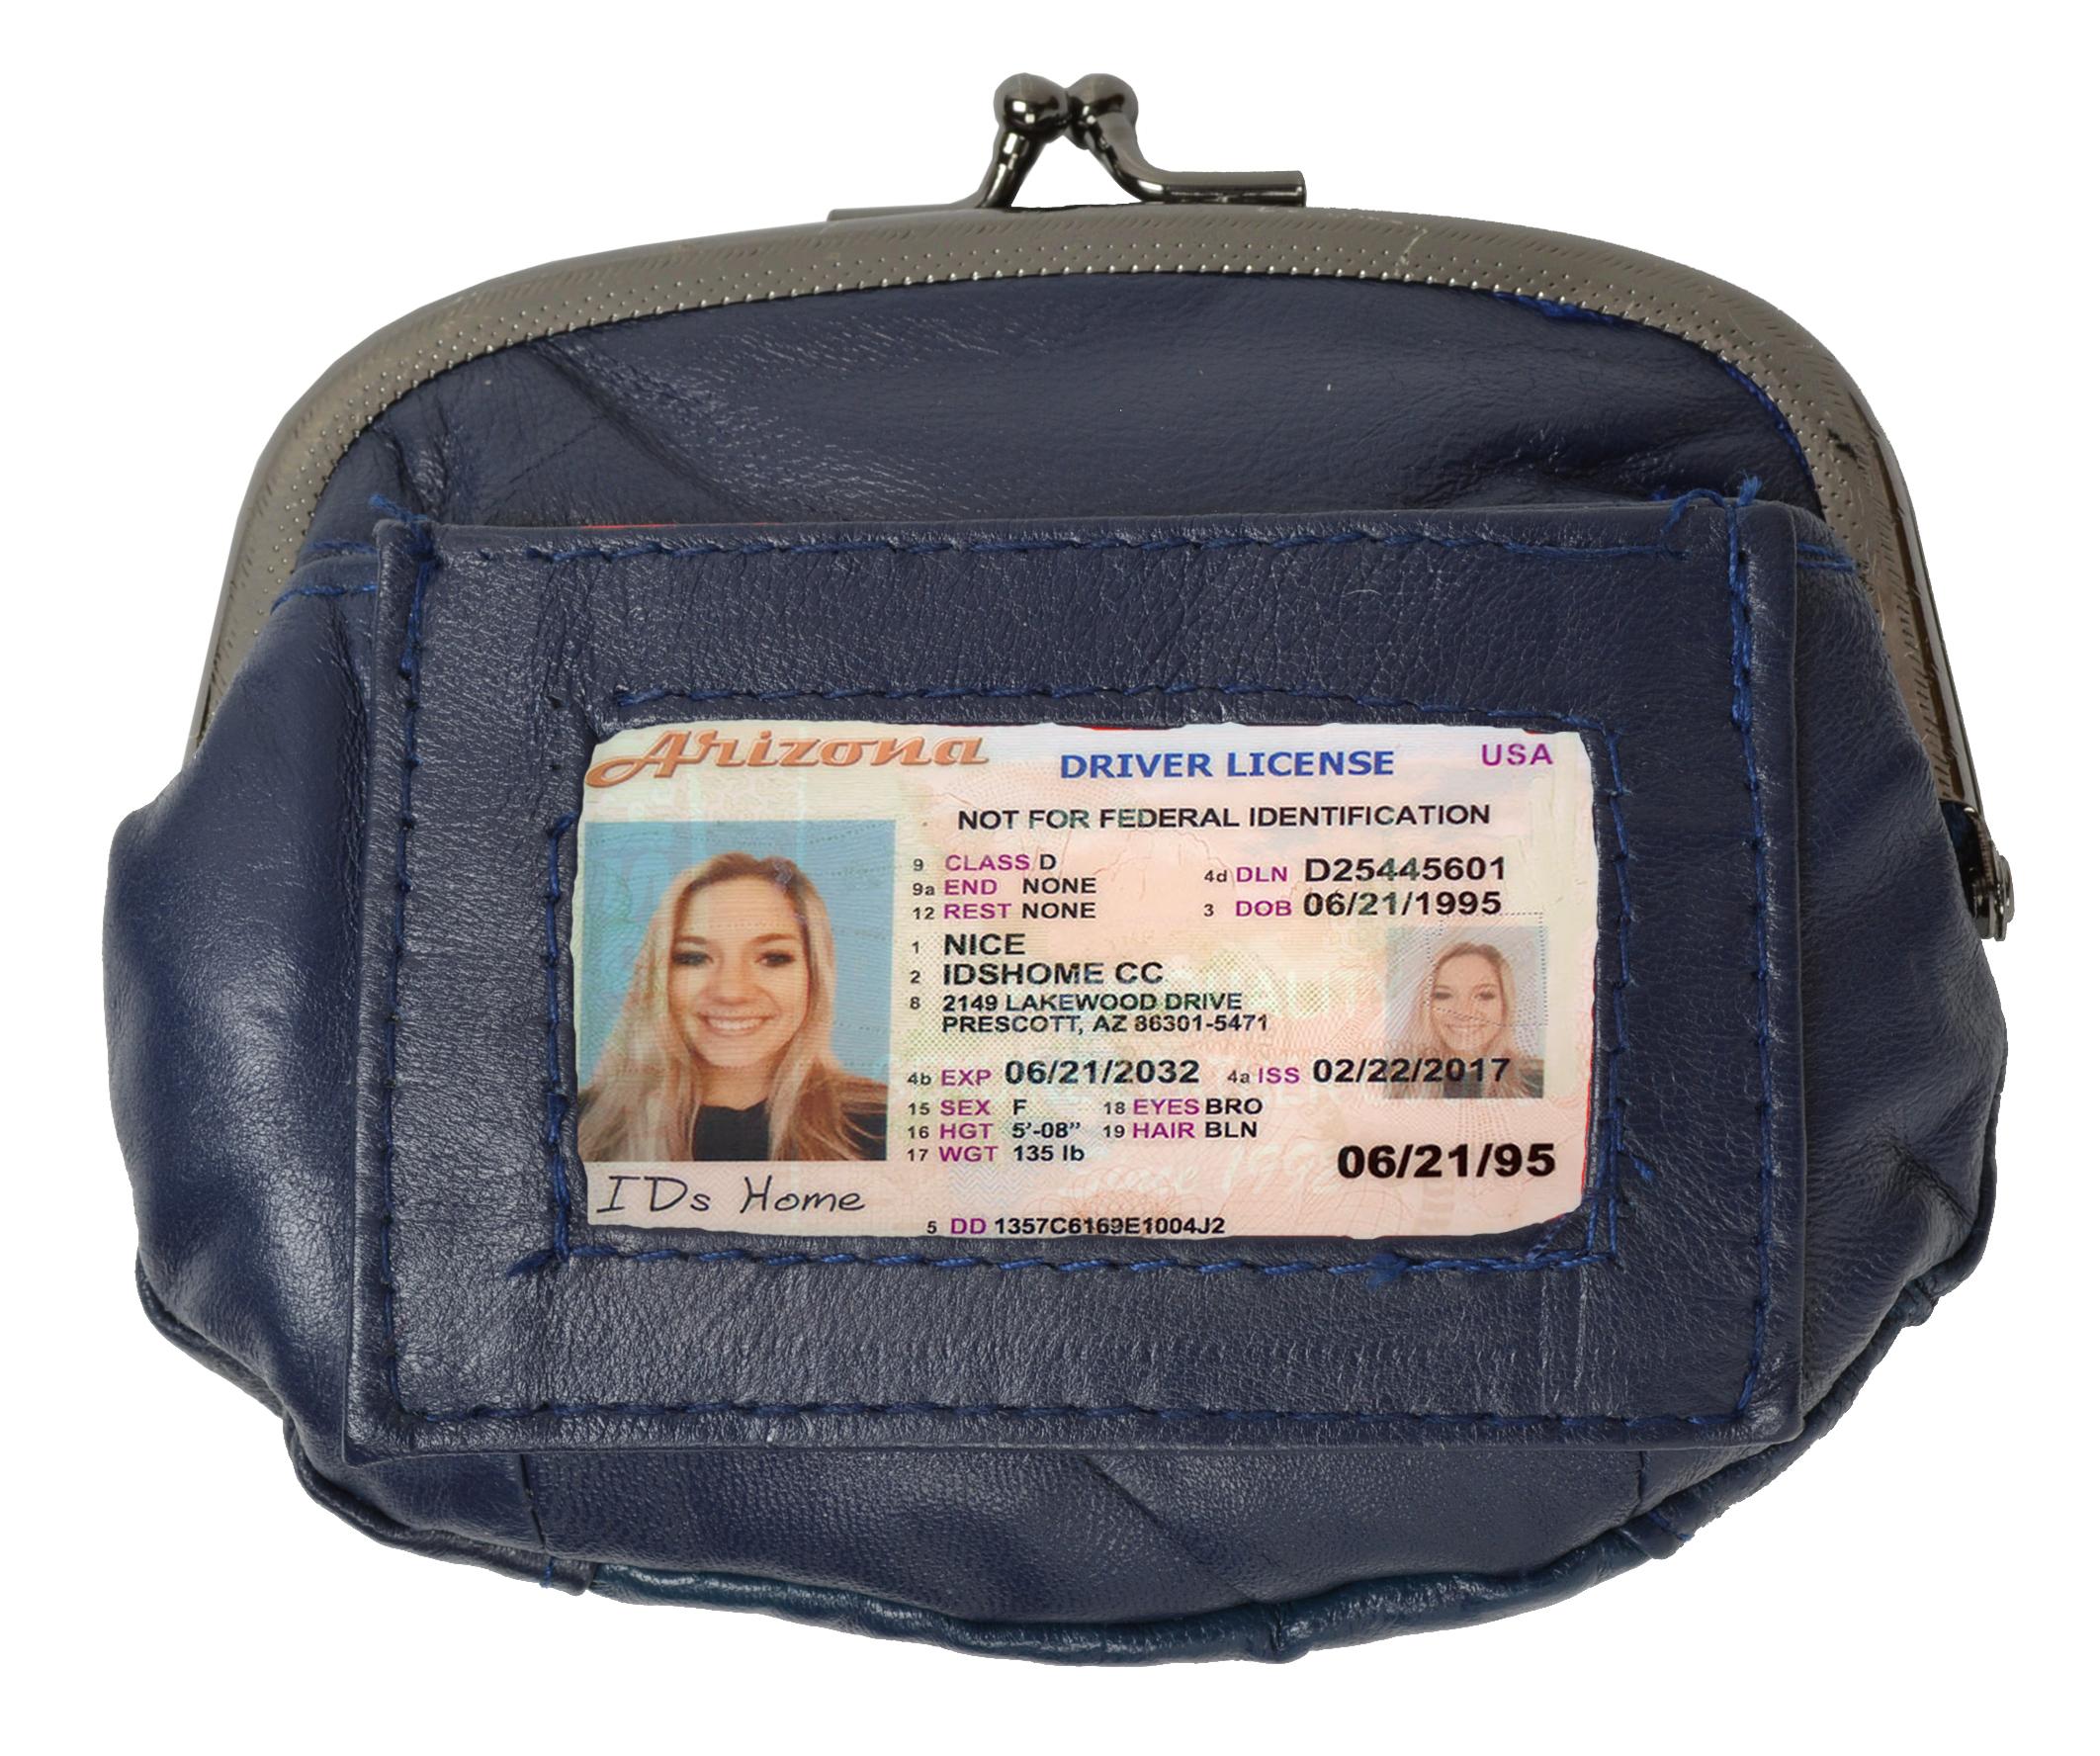 AFONiE - Soft Lambskin ID Change Purse - navy blue photo